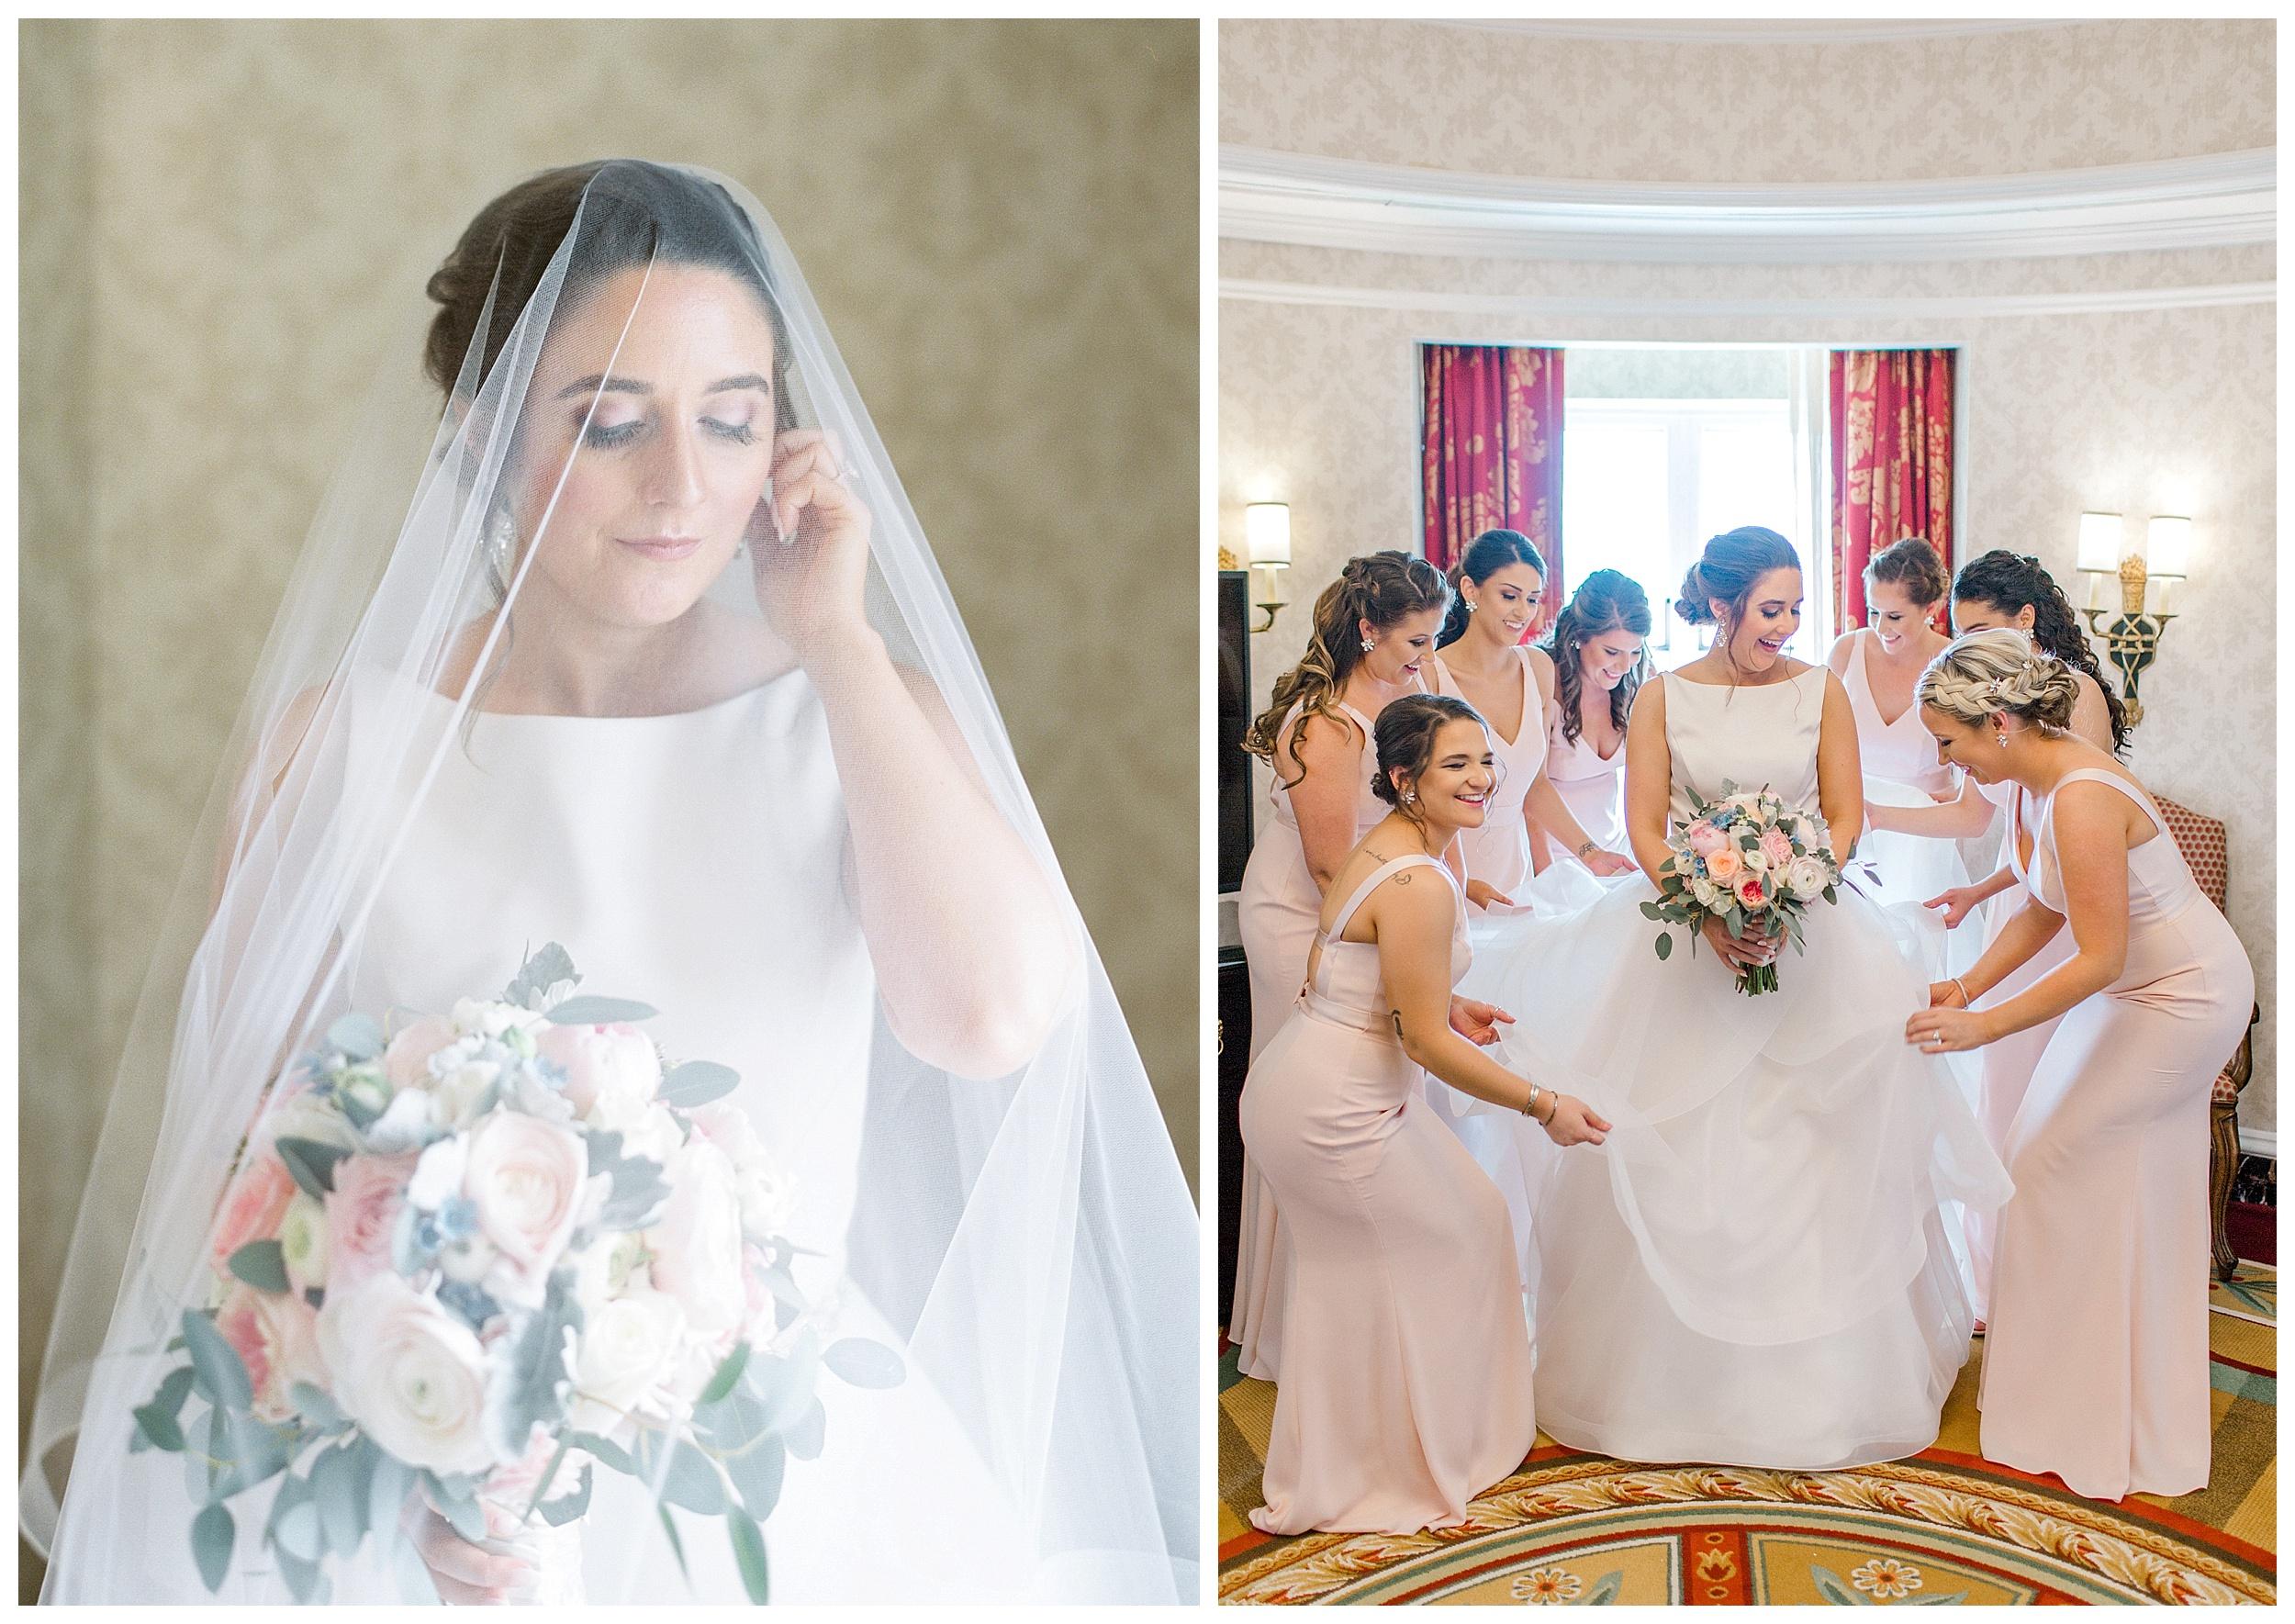 DAR Constitution Hall Wedding Wedding | Daughters of the American Revolution Wedding | District of Columbia Film Wedding Photographer Kir Tuben_0022.jpg